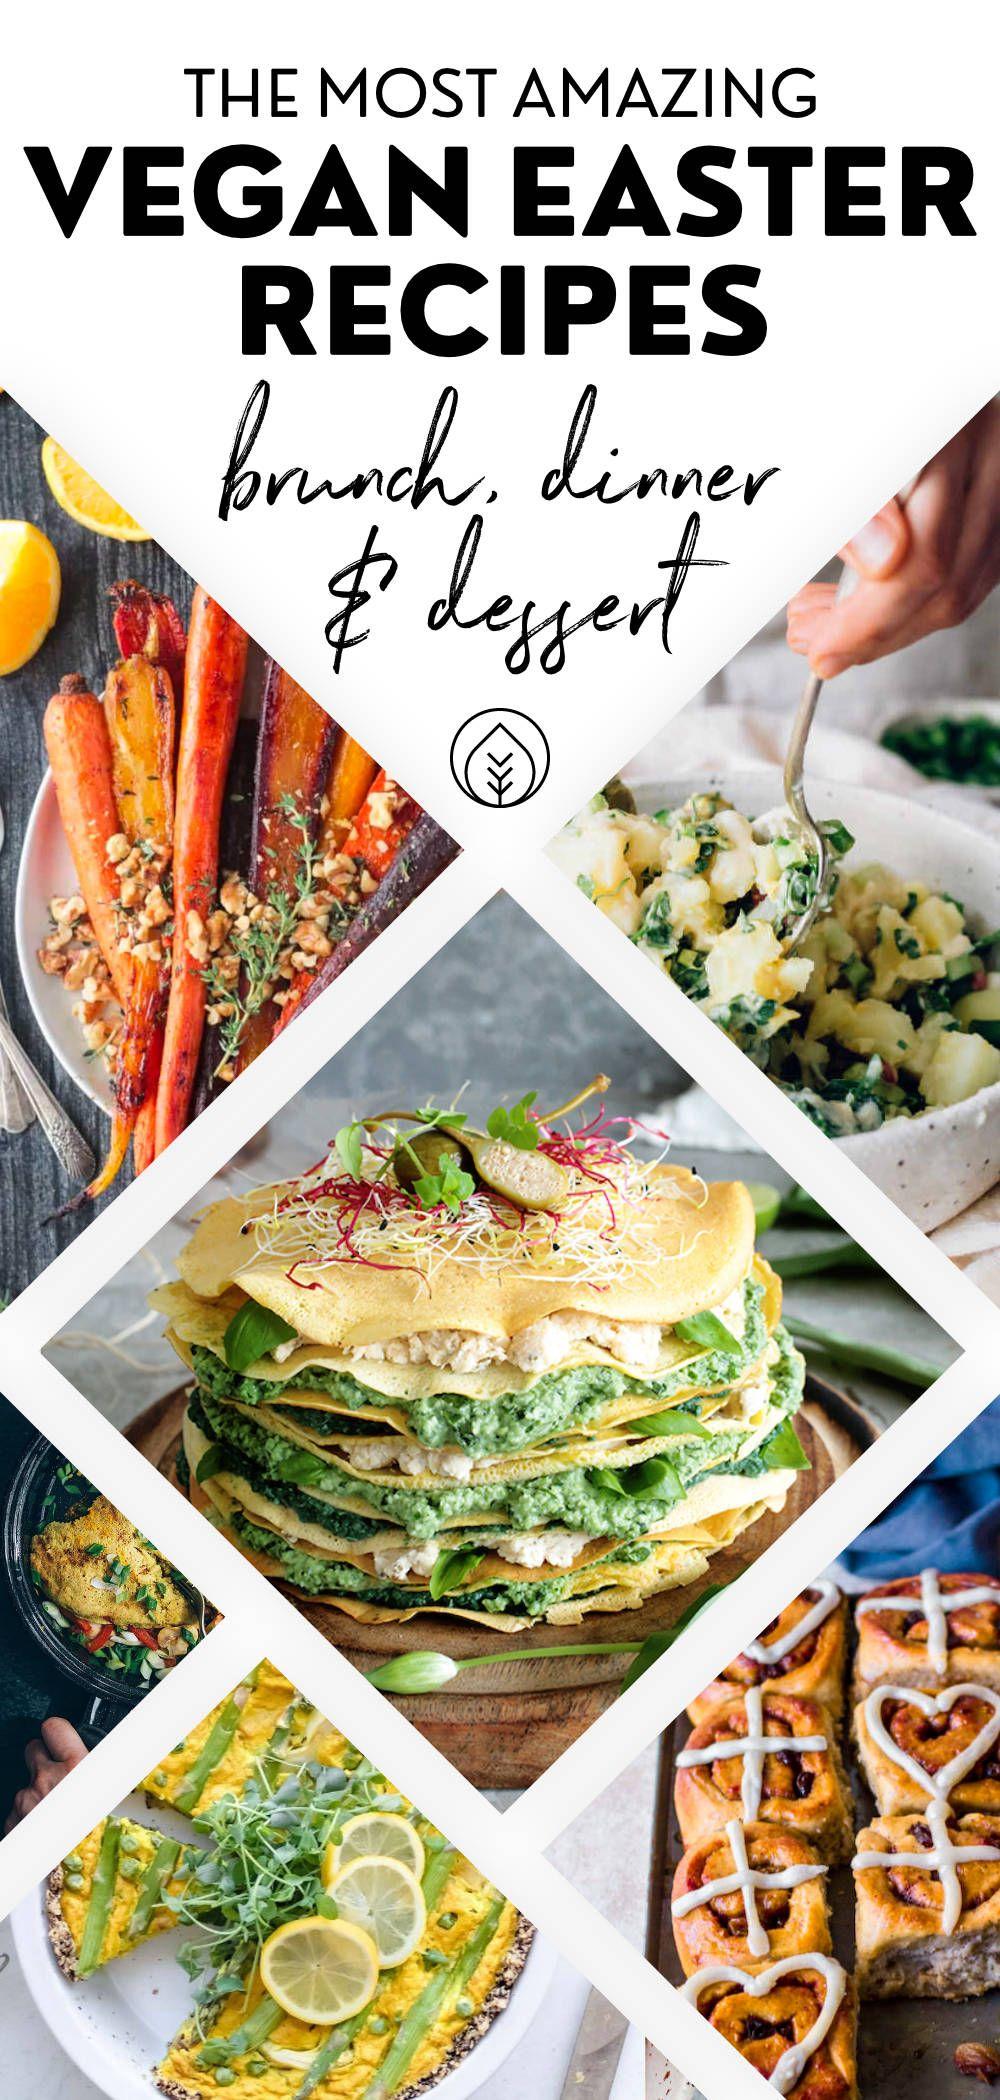 46 Healthy Vegan Easter Recipes Breakfast To Dinner In 2020 Vegetarian Easter Recipes Vegan Easter Recipes Vegan Brunch